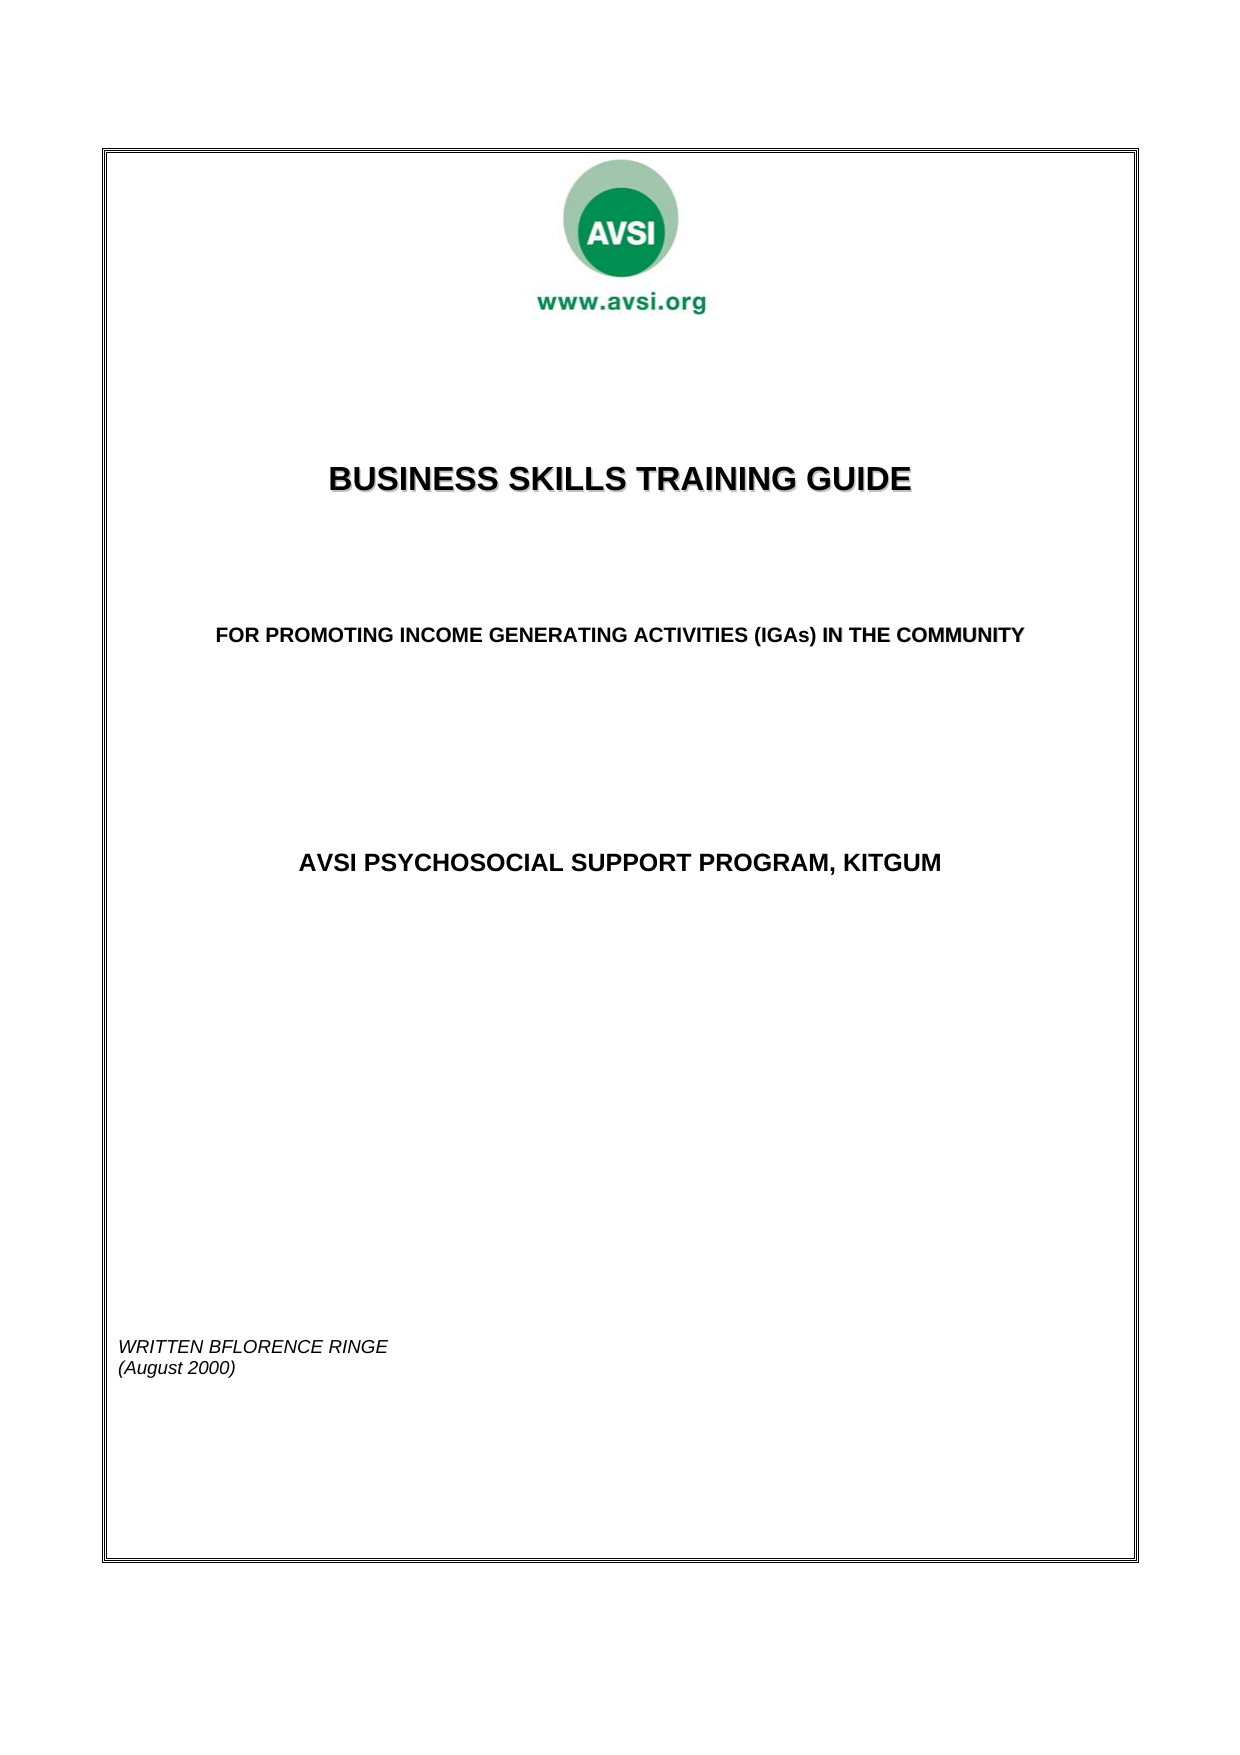 Business Skills Training Guide